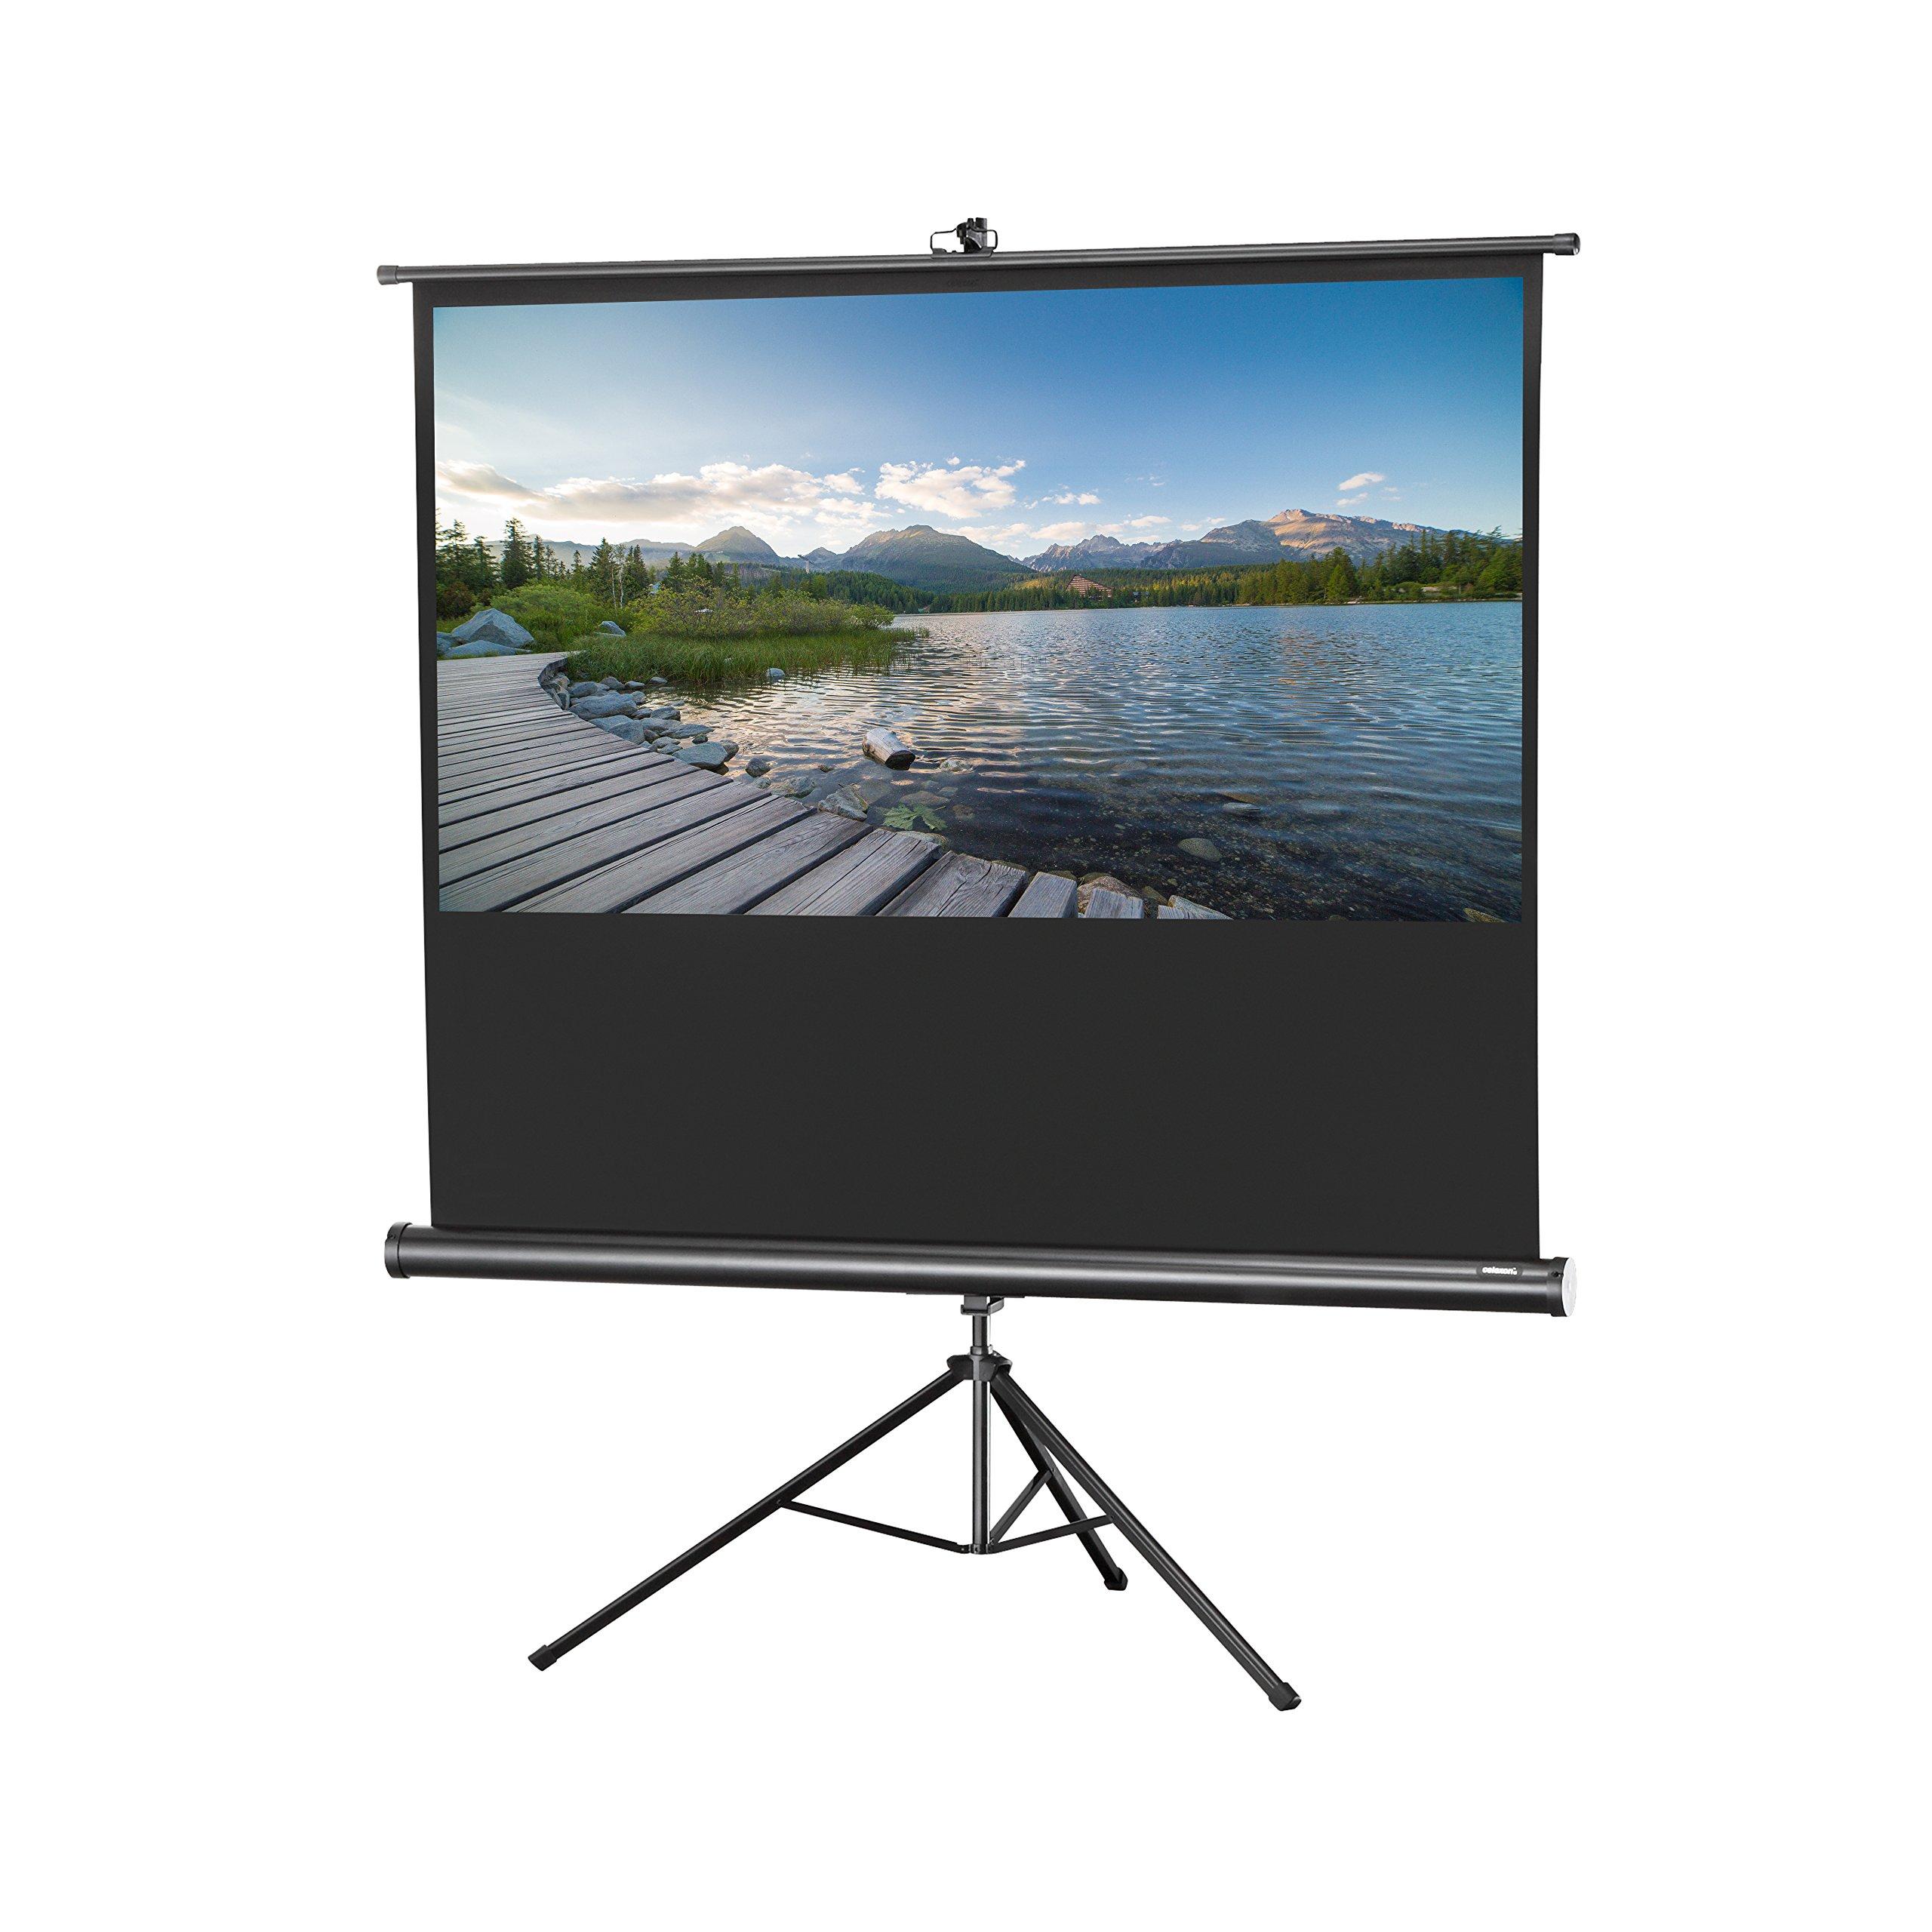 celexon 120'' Tripod Projector Screen Tripod Economy, 96 x 72 inches viewing area, 4:3 format, White edition